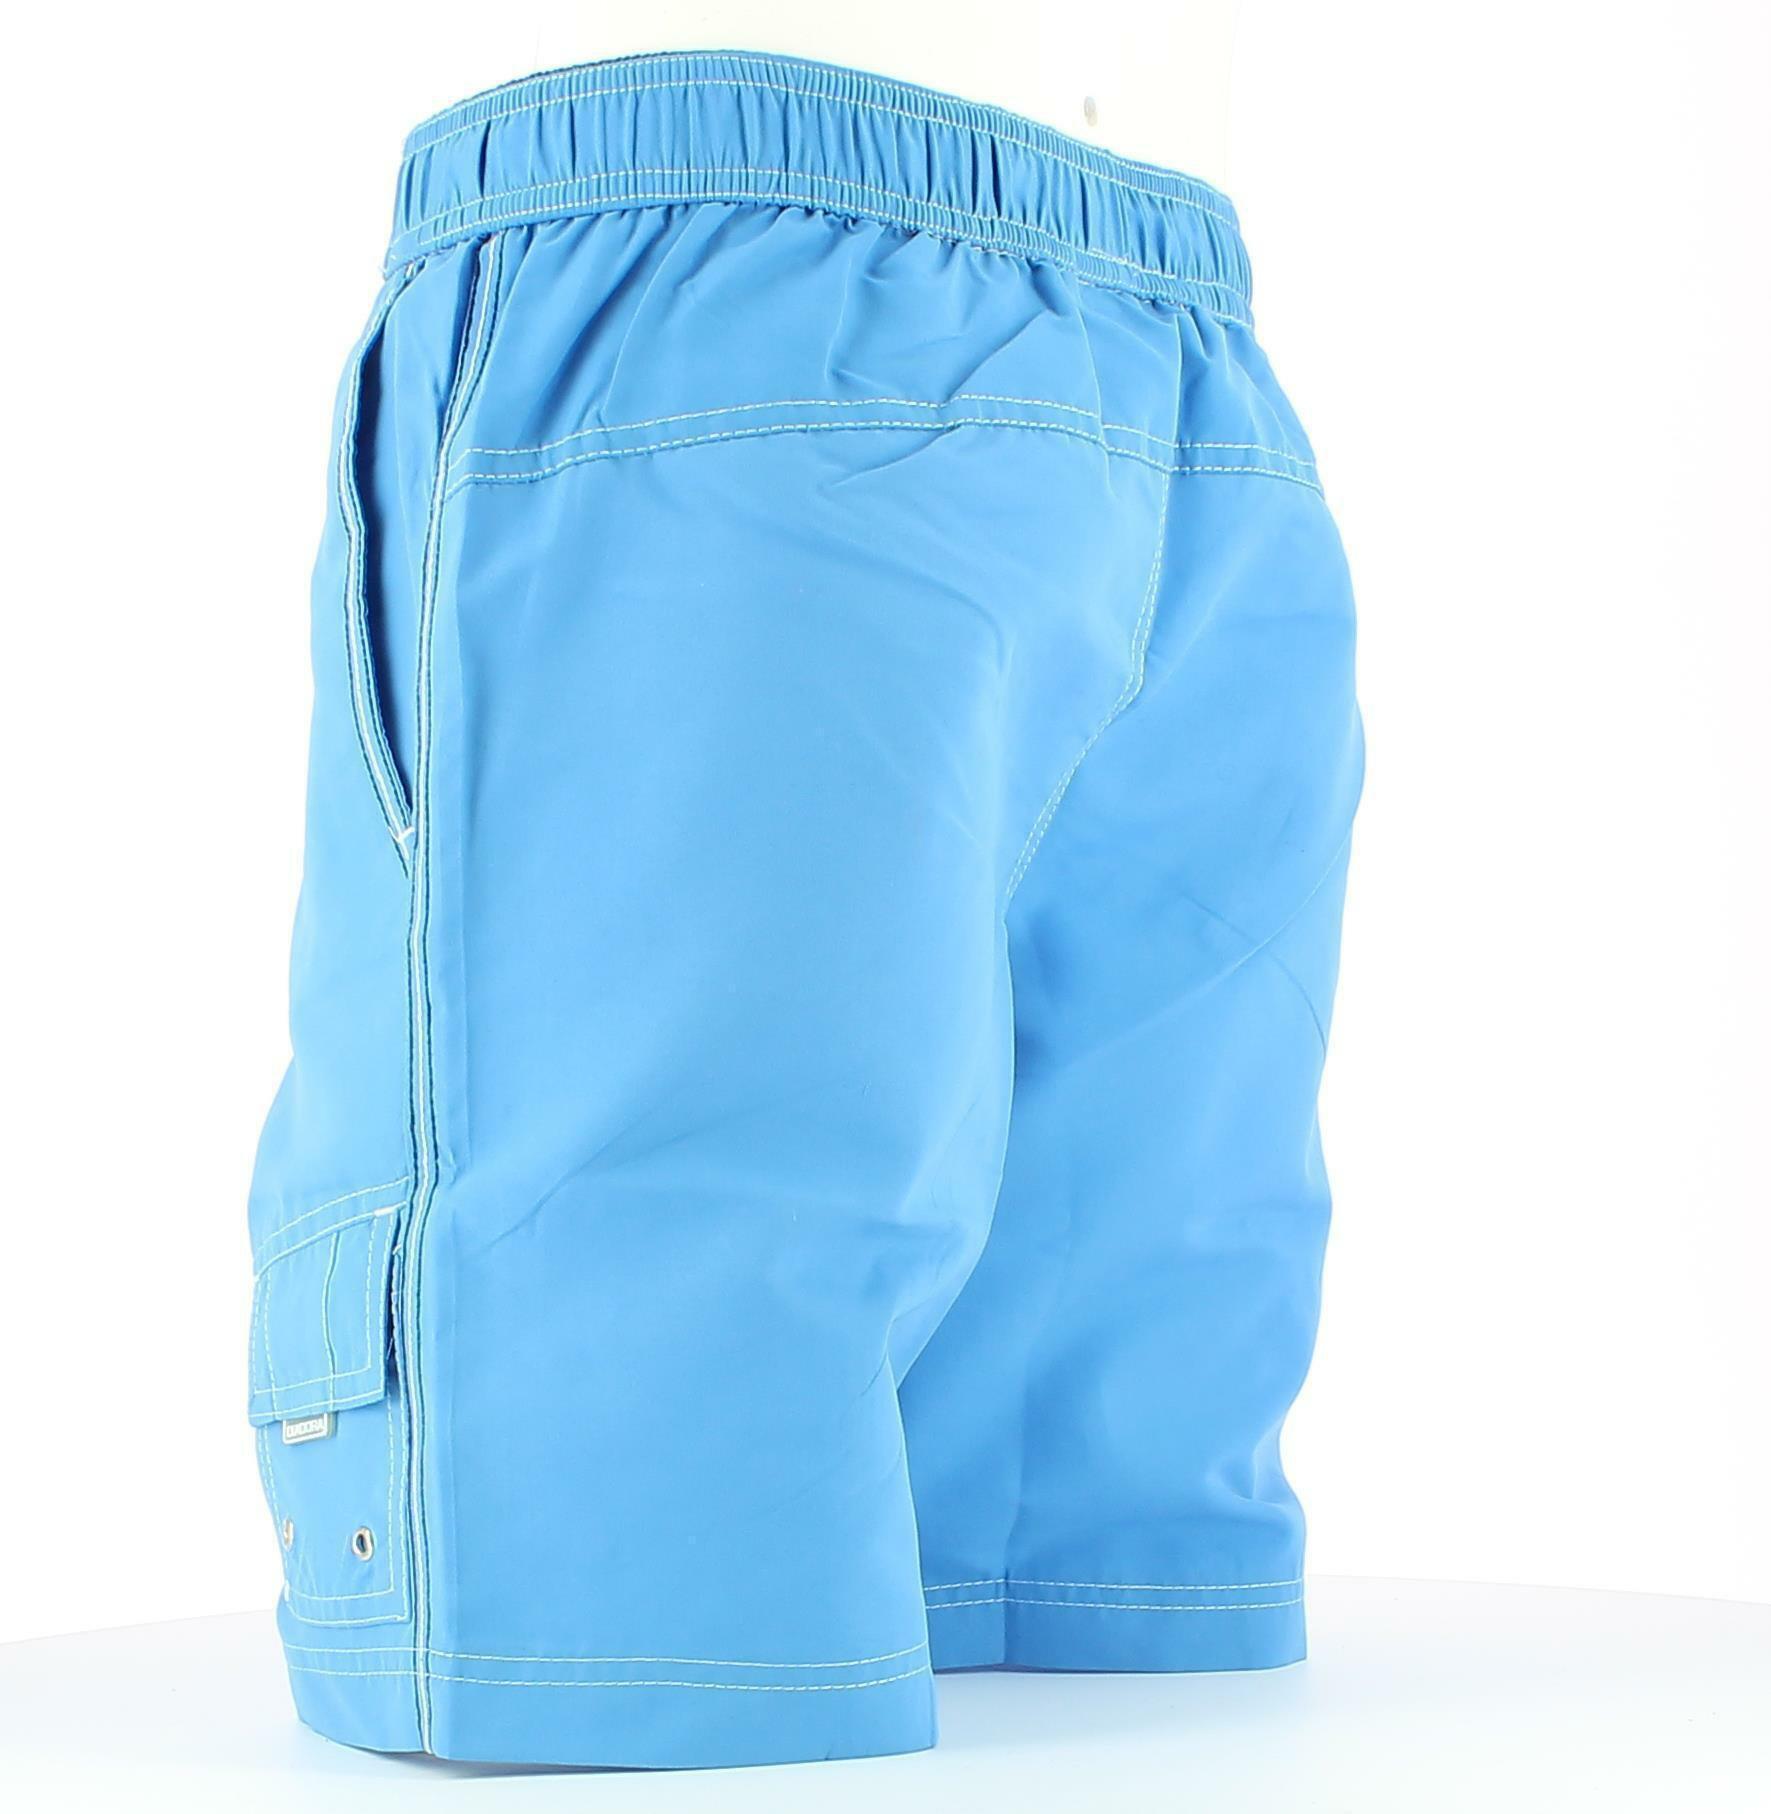 diadora diadora boardshort costume uomo pantaloncino azzurro